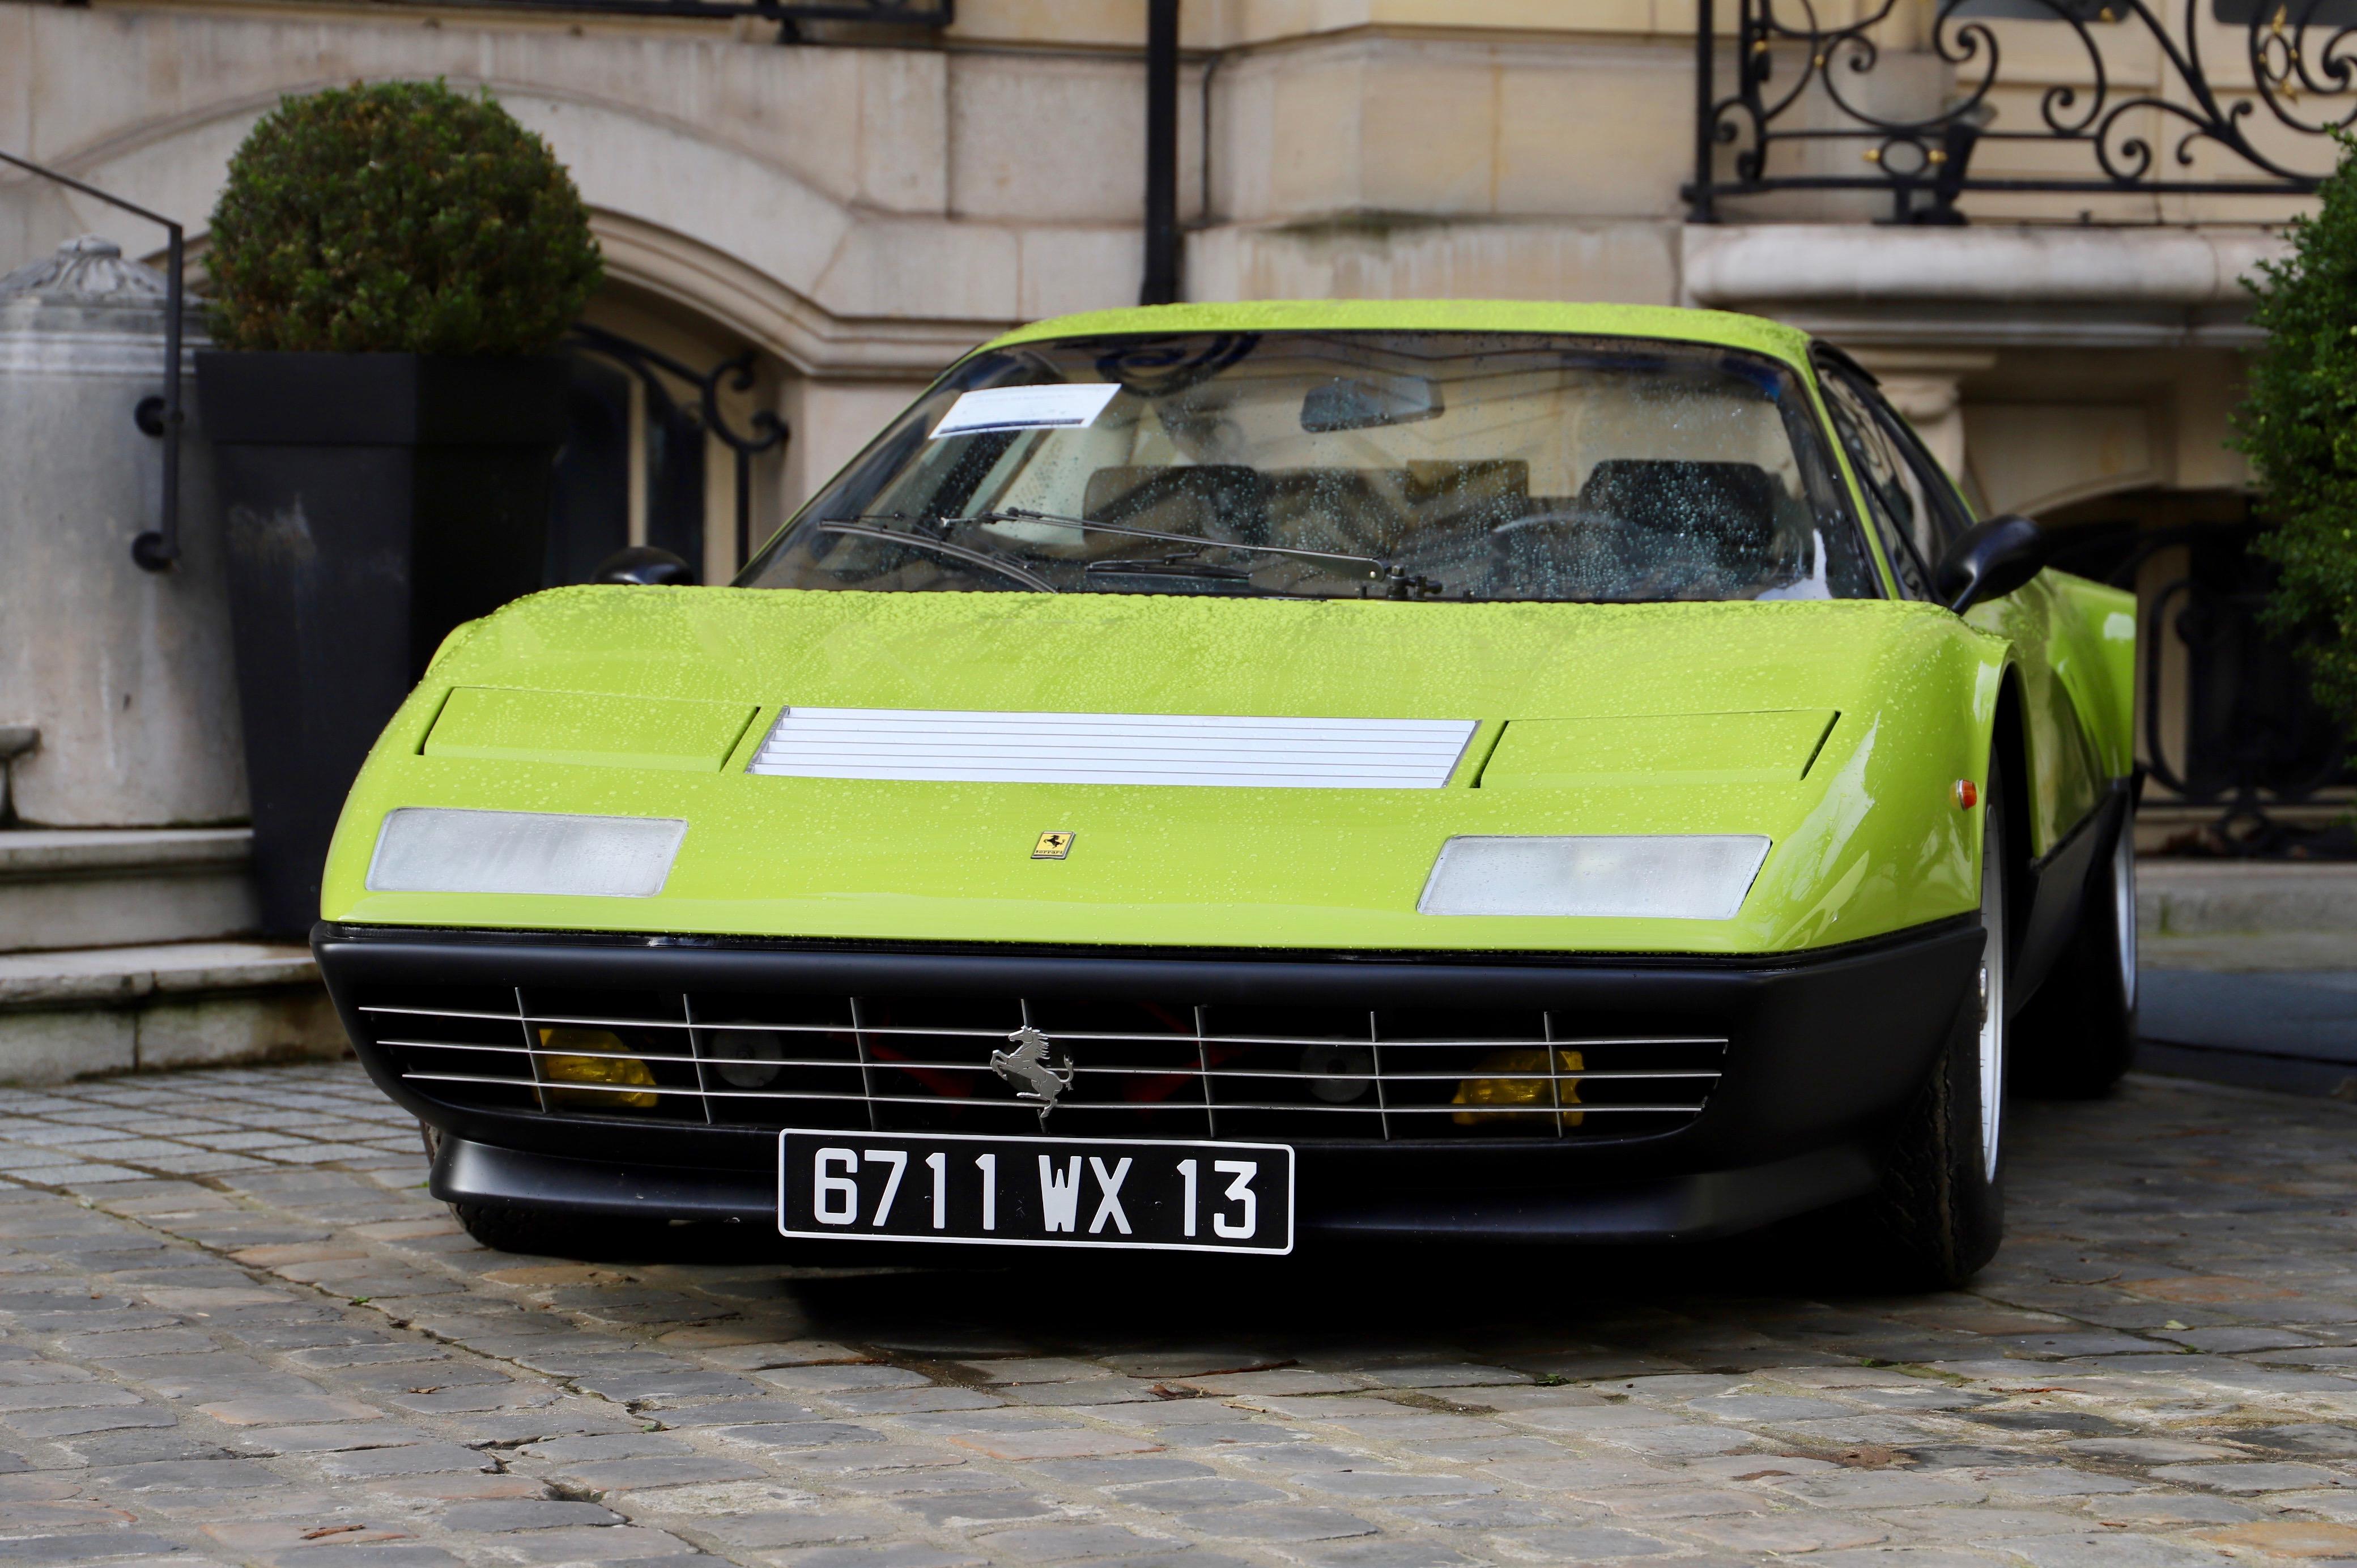 Ferrari 512 BB 1980 - La Parisienne 2021 - Motorcars Artcurial - photo Ludo Ferrari